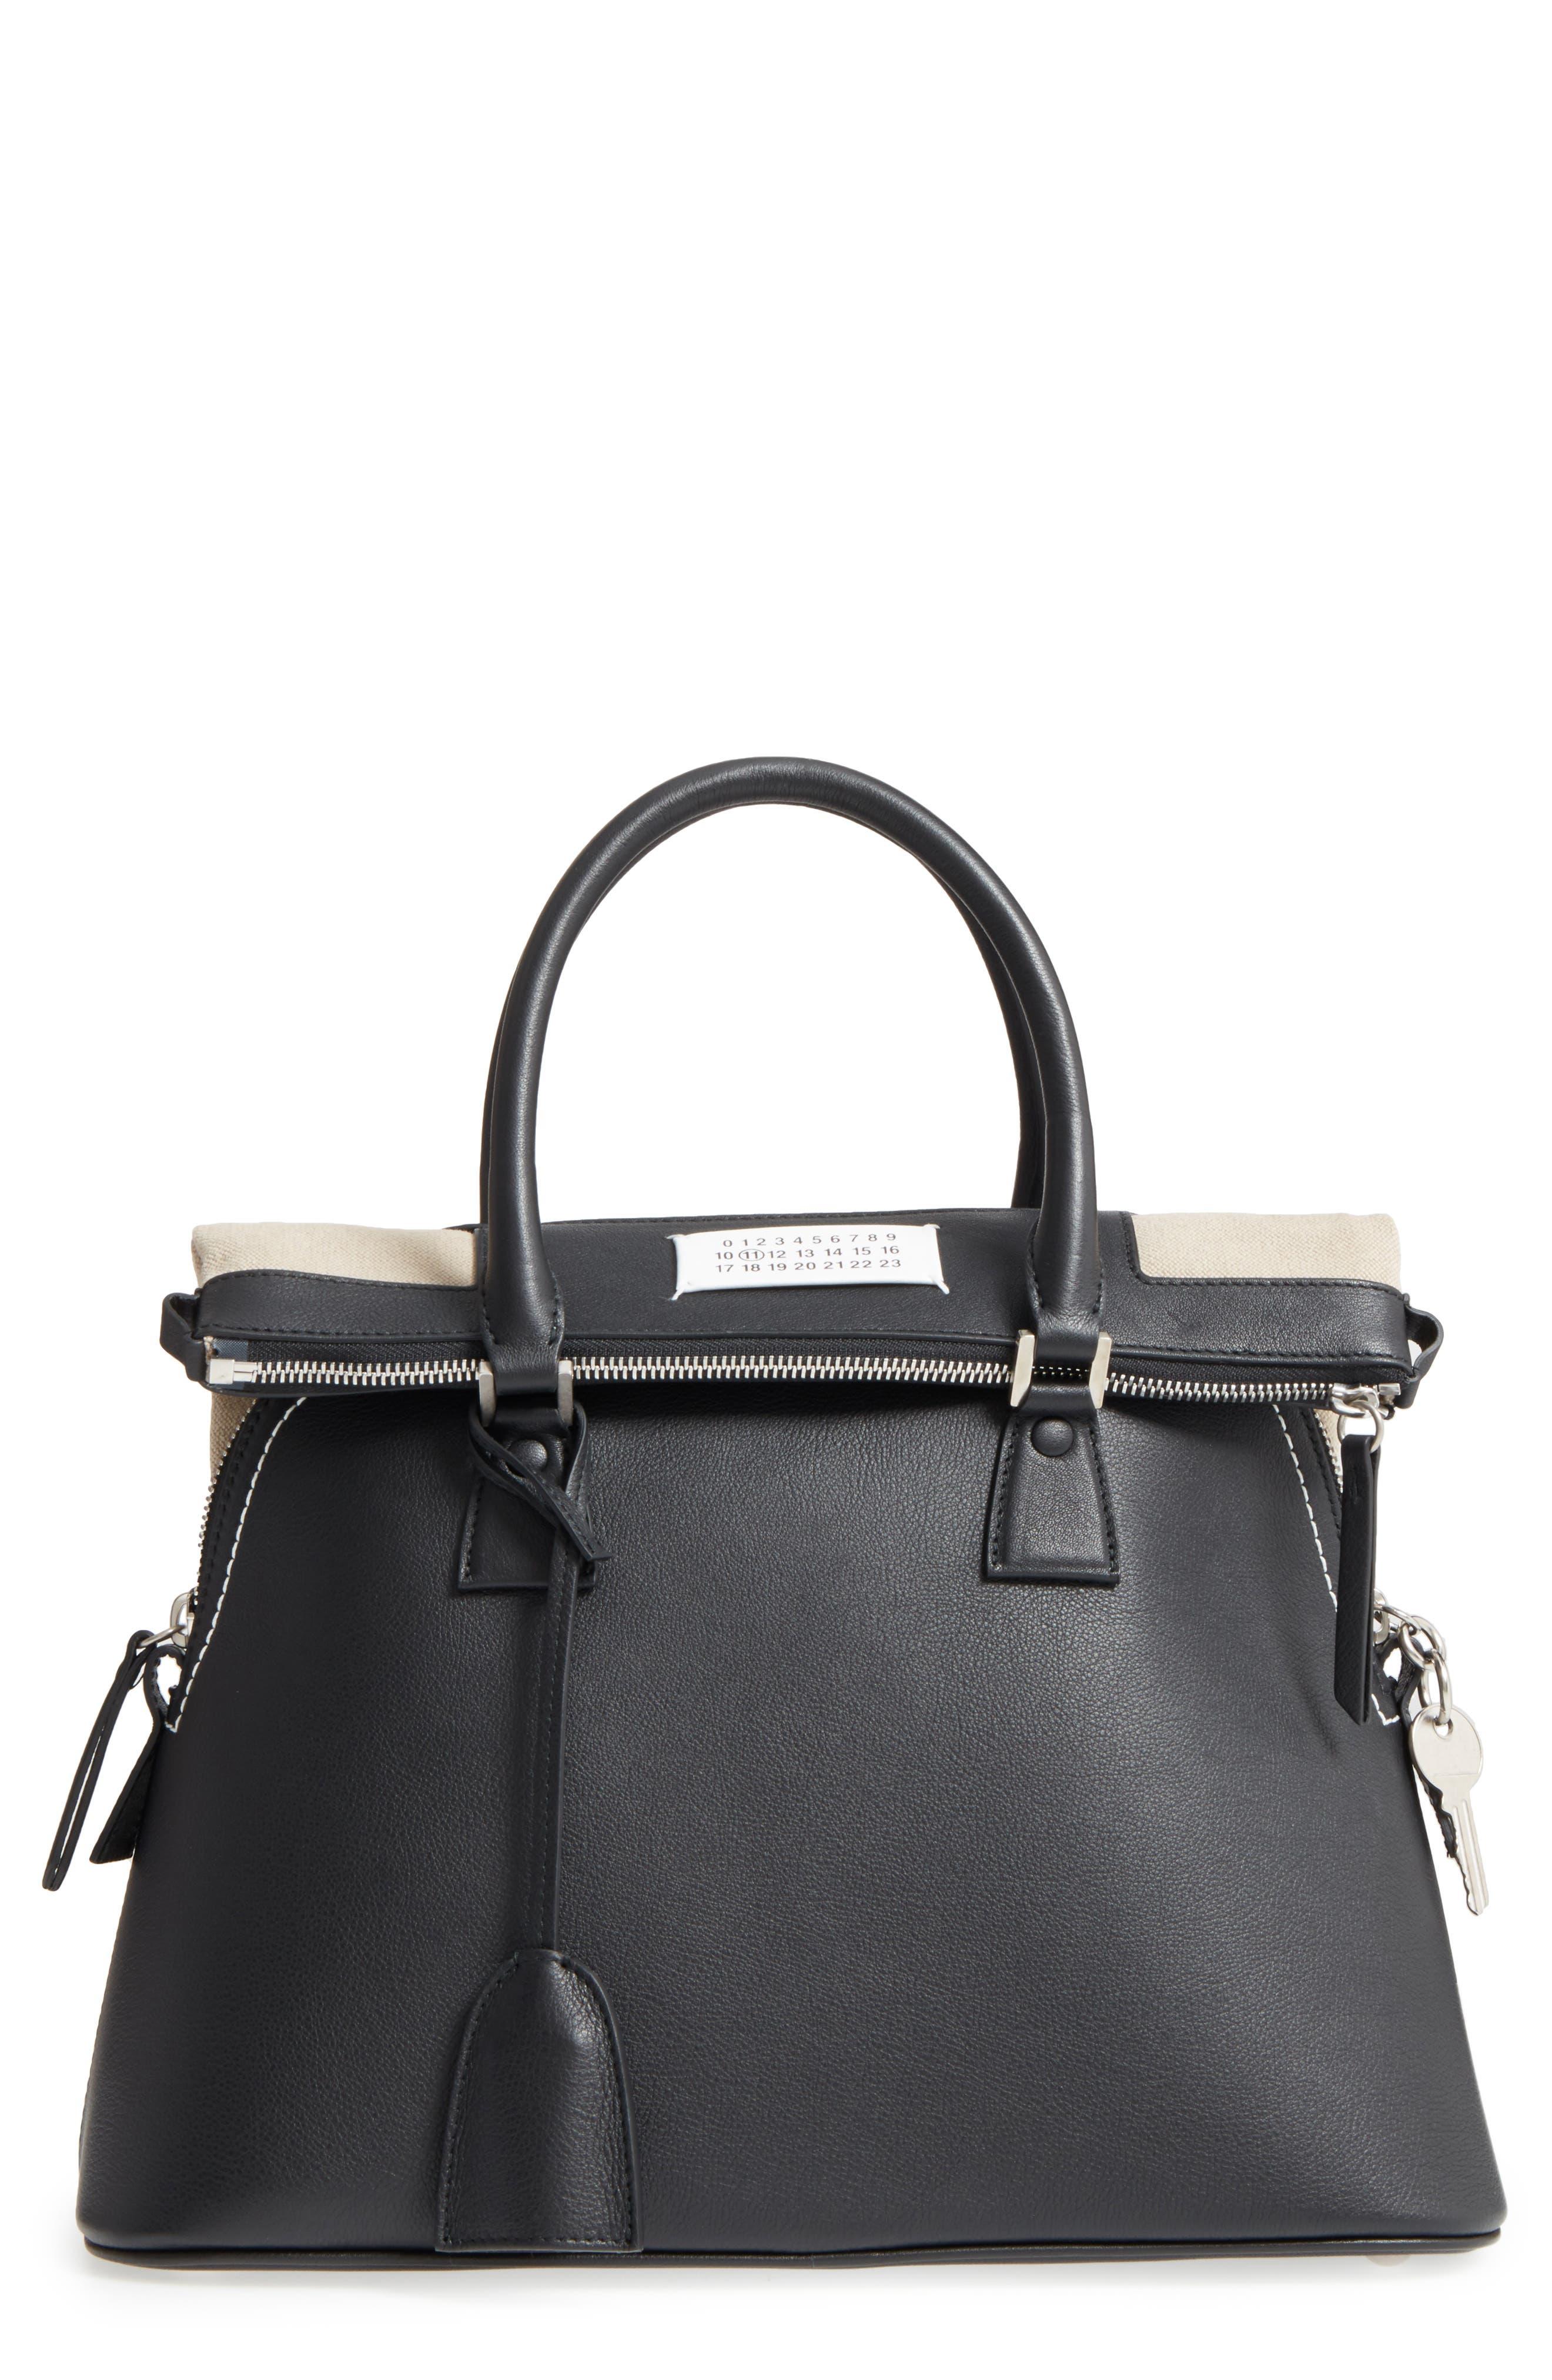 Medium 5AC Leather Handbag,                         Main,                         color, 001